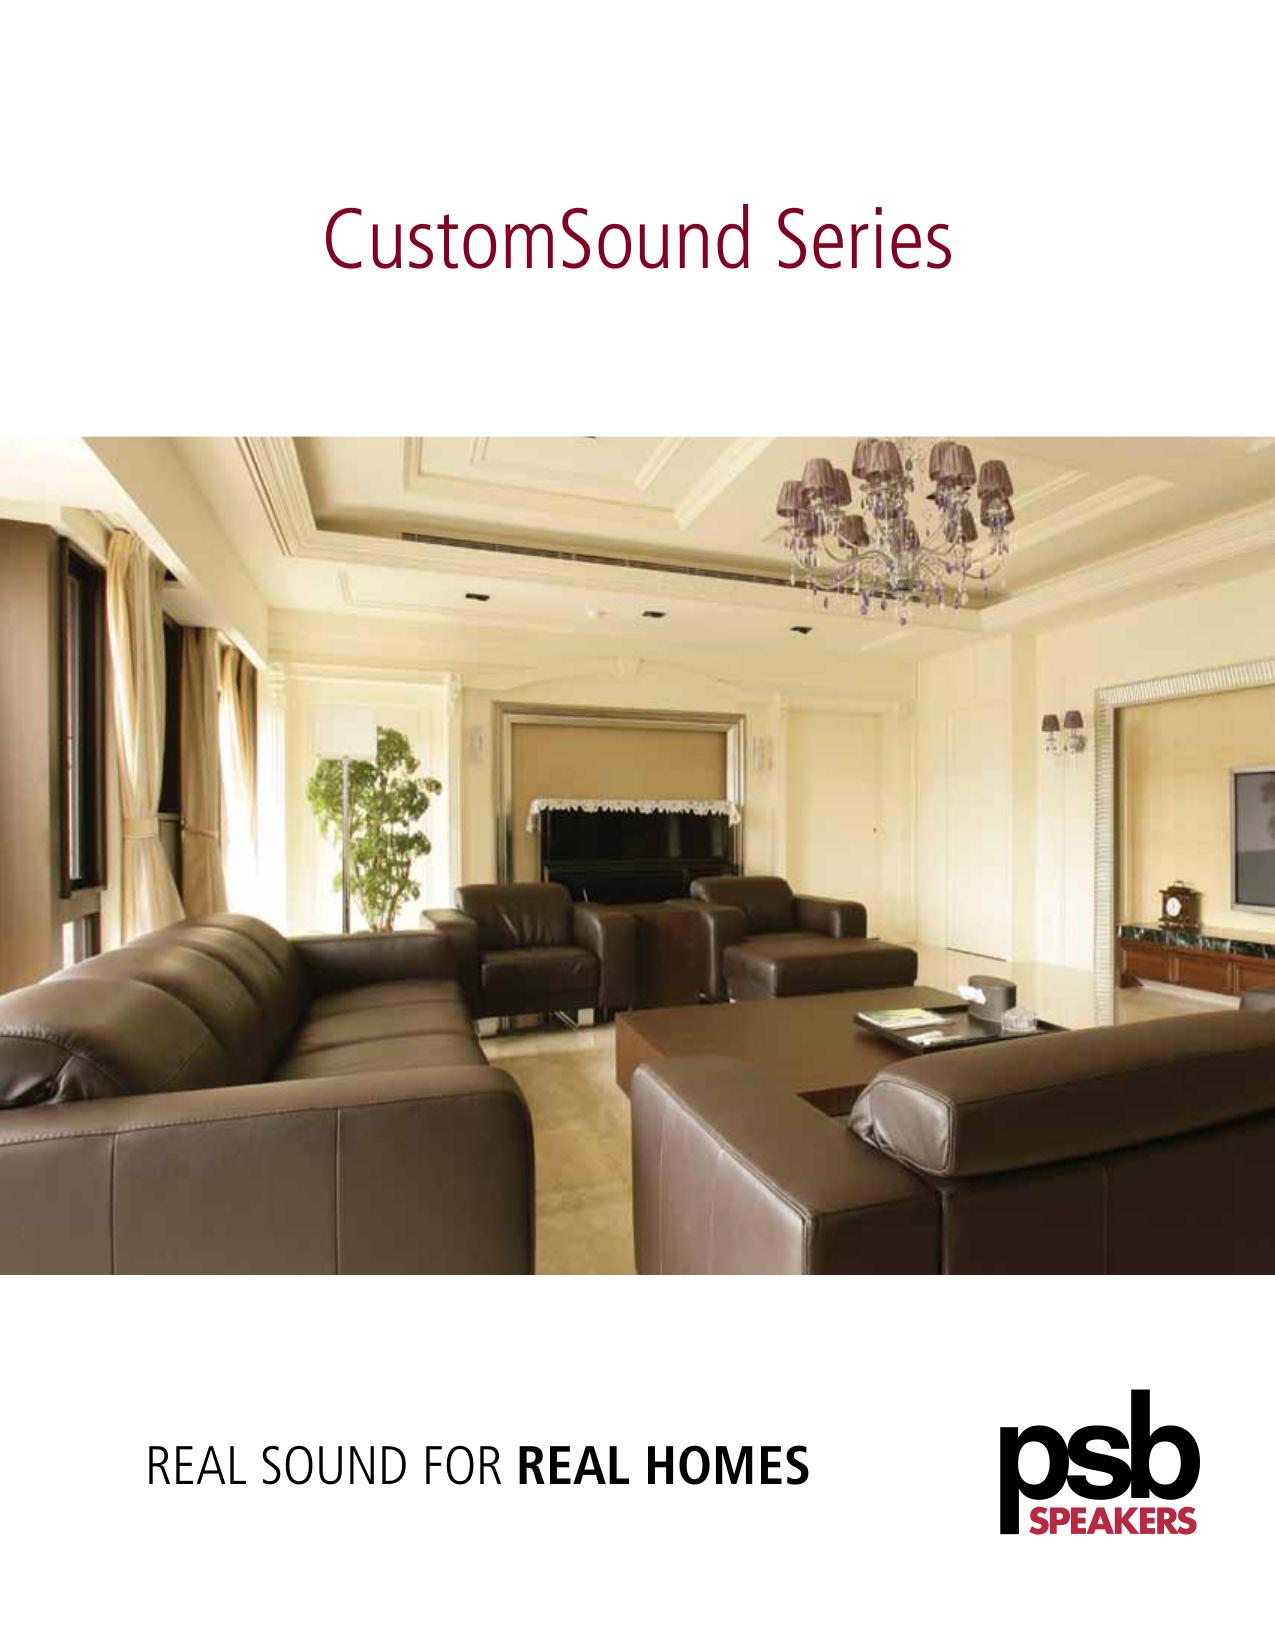 pdf for PSB Speaker System CustomSound CW262 manual